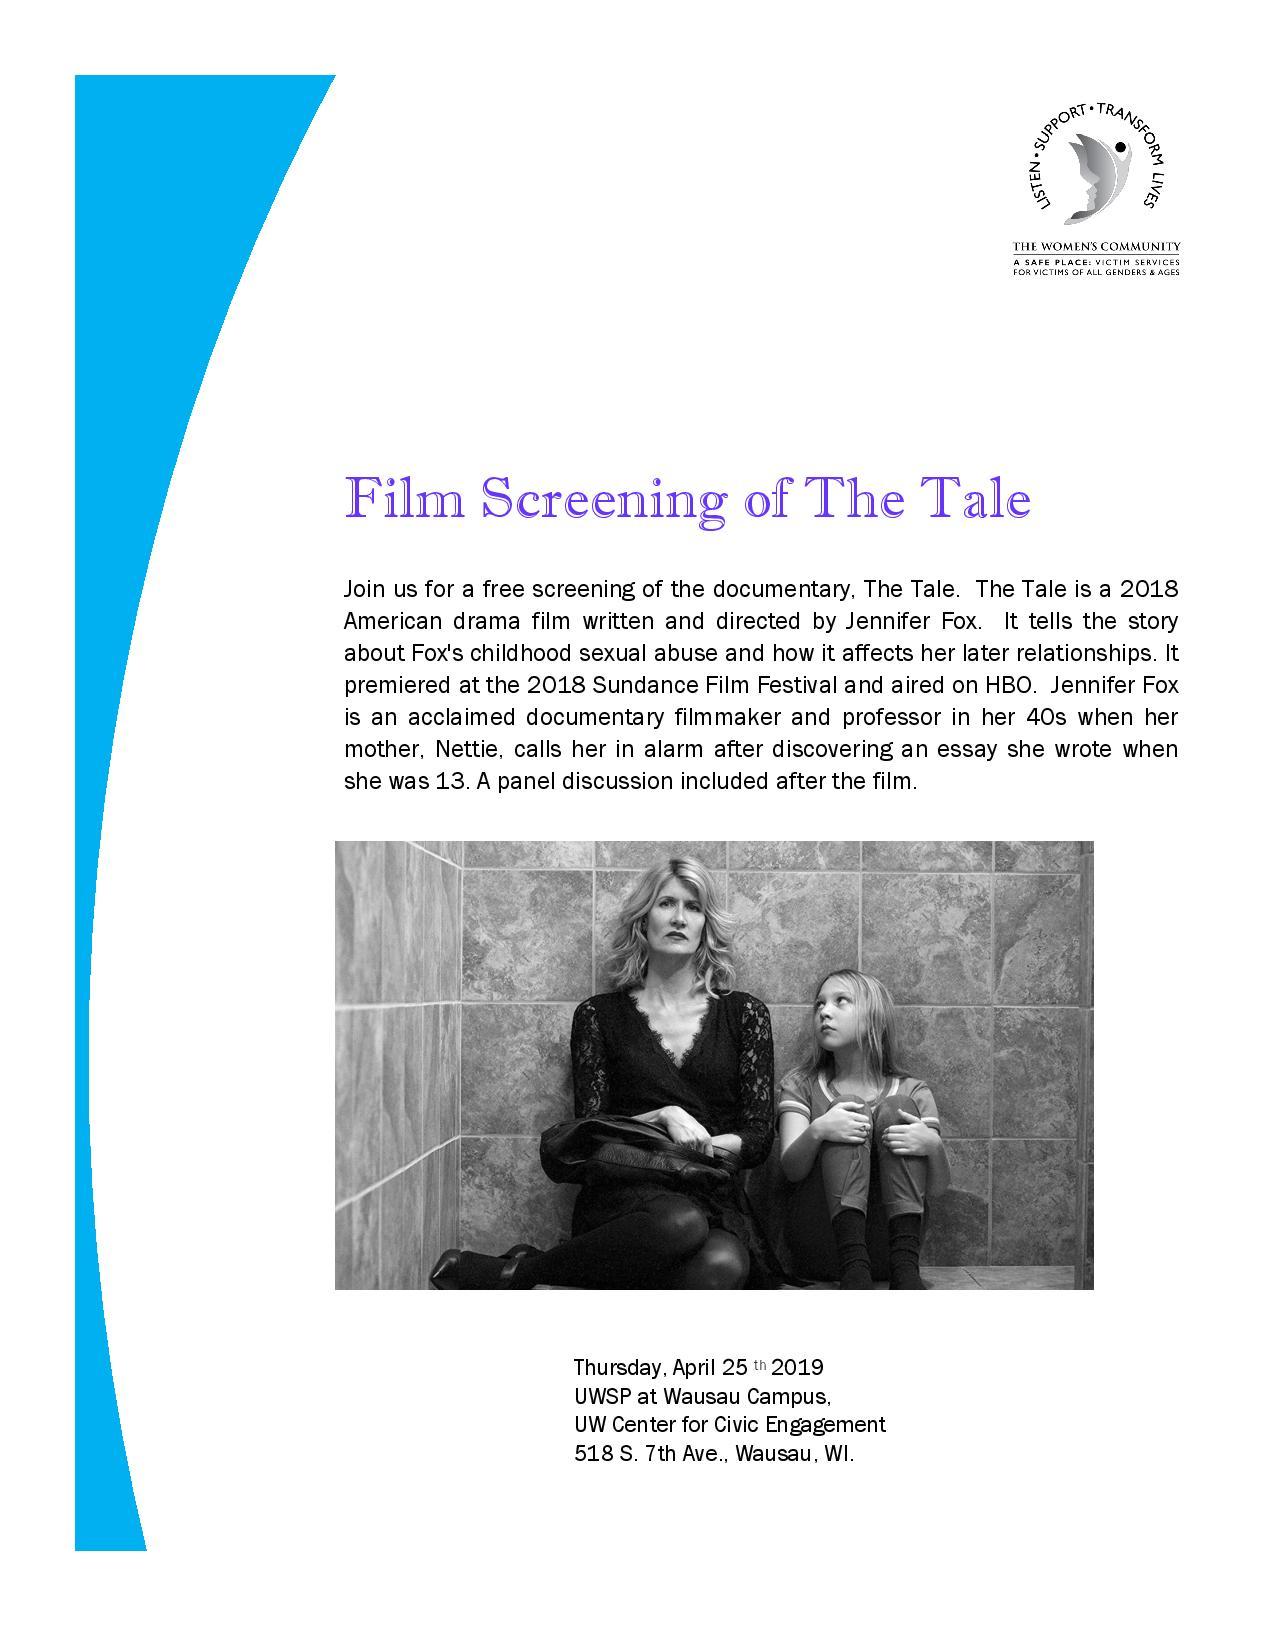 Film Screening of The Tale